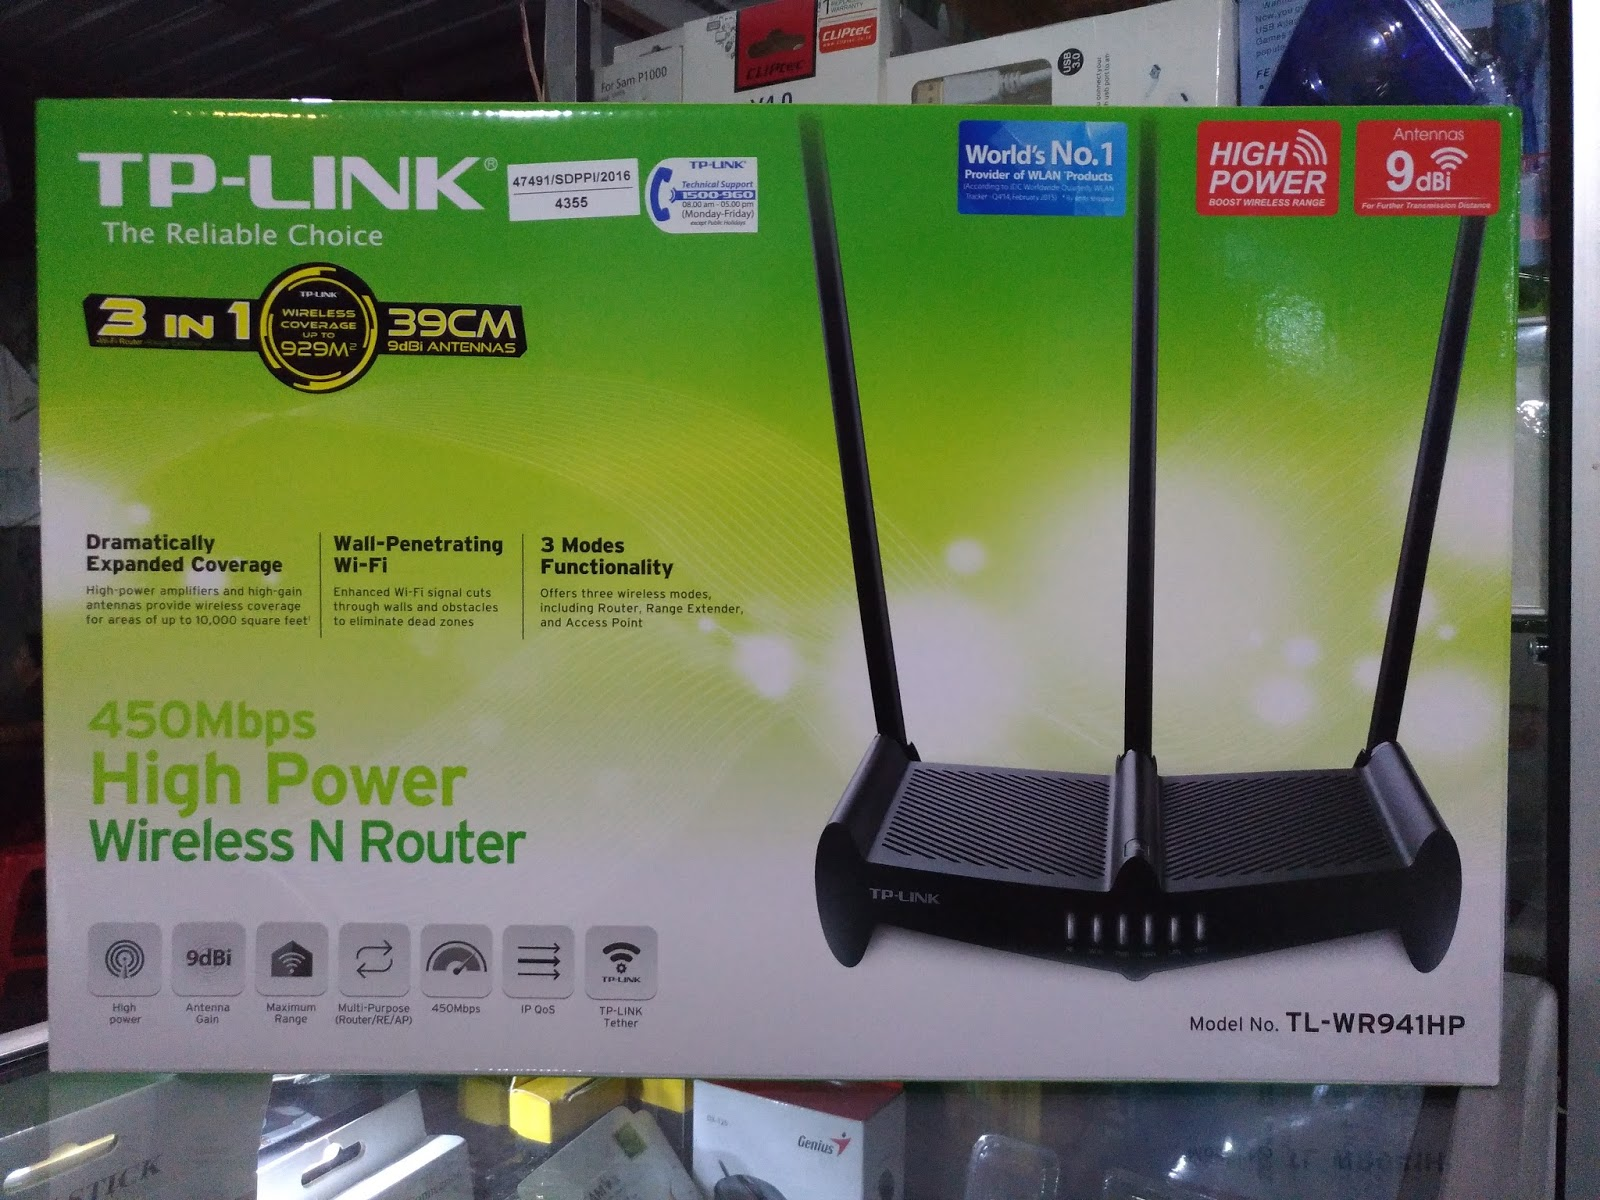 JUAL TP LINK WiFi TL WR941HP 450Mbps High Power Wireless N